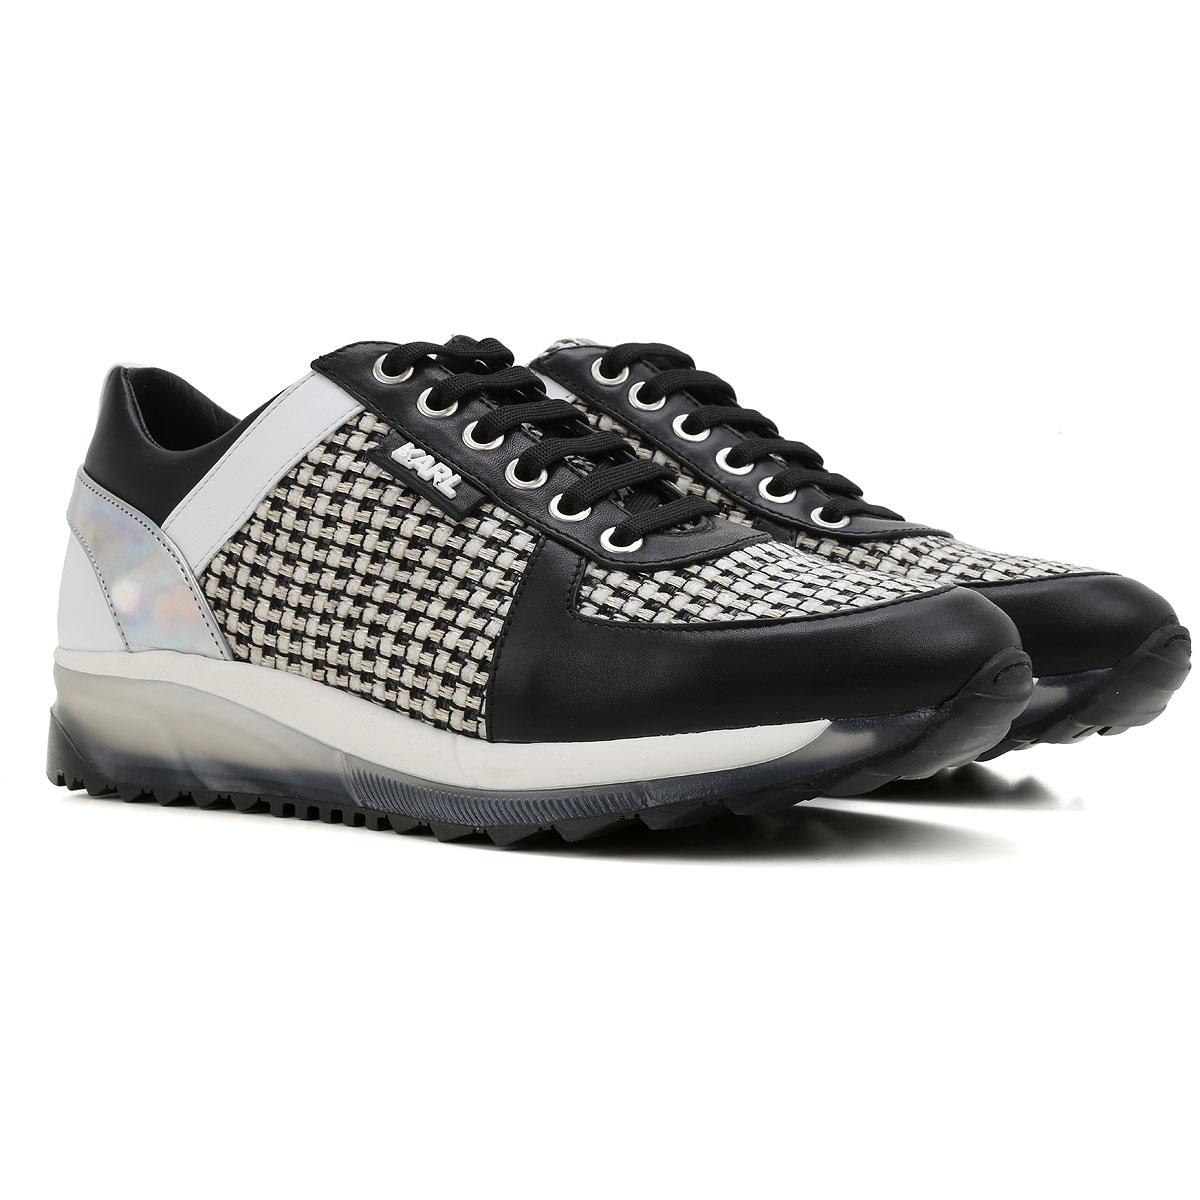 chaussures femme karl lagerfeld code produit 61kw4009 multi. Black Bedroom Furniture Sets. Home Design Ideas